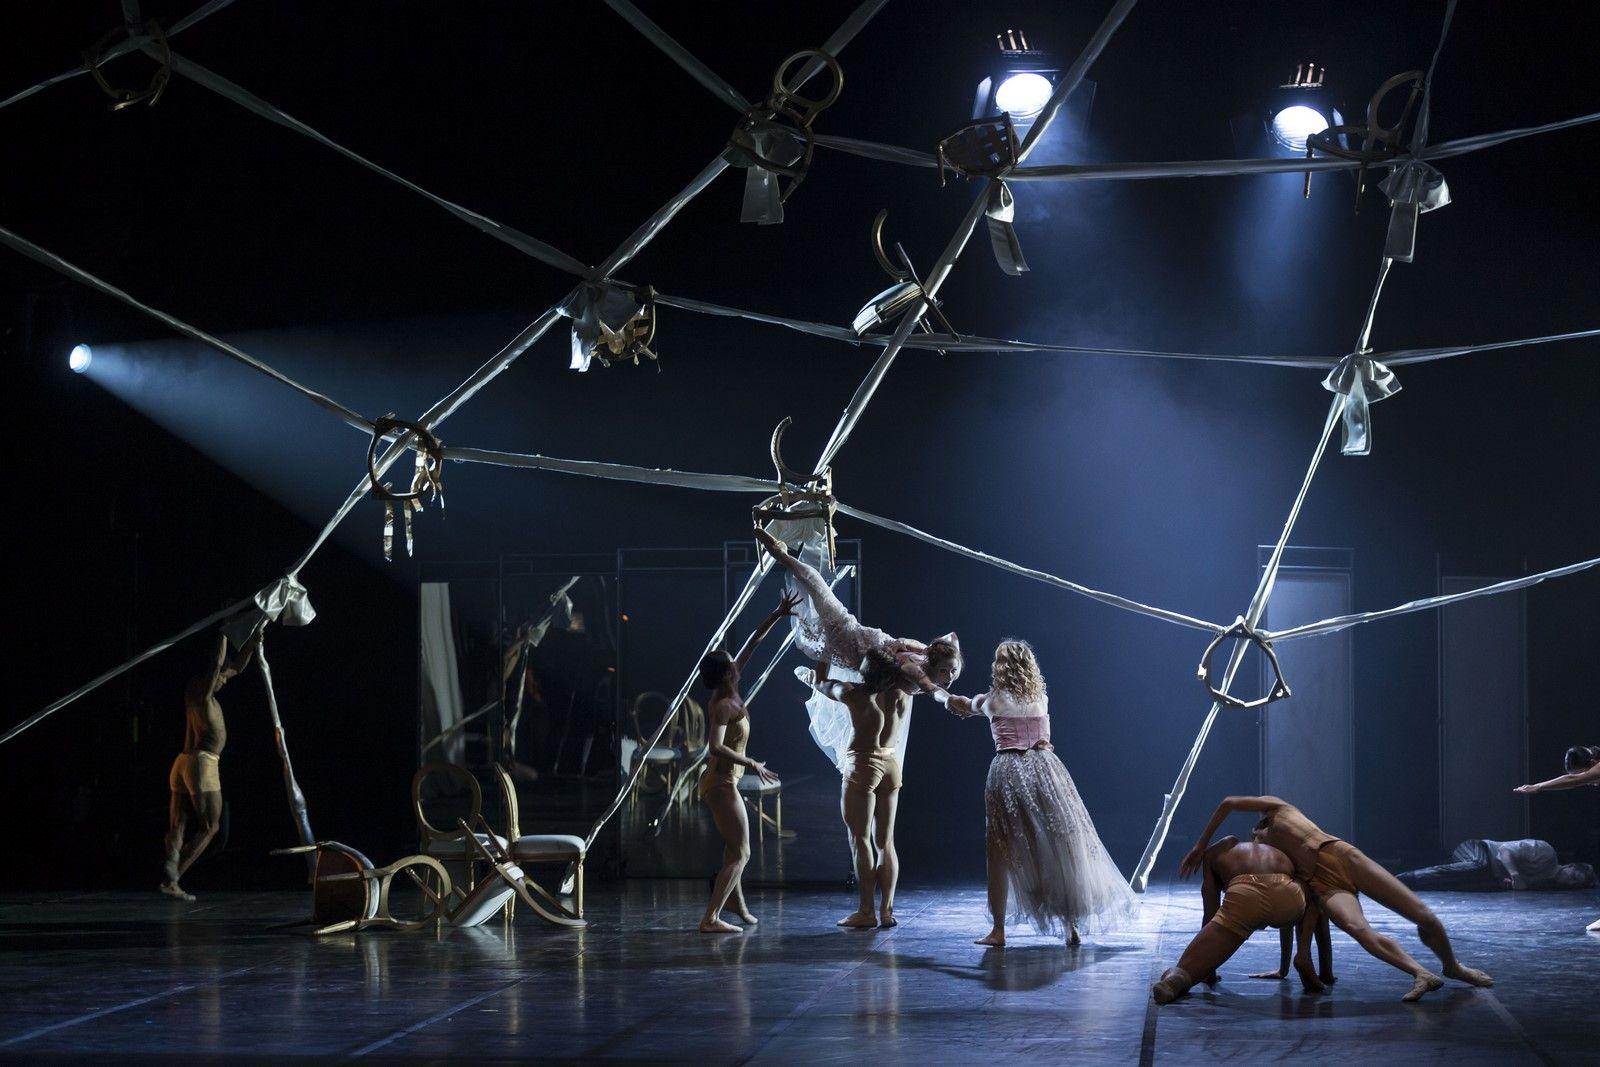 Anmeldelse: Farlige forbindelser, Det Kongelige Teater